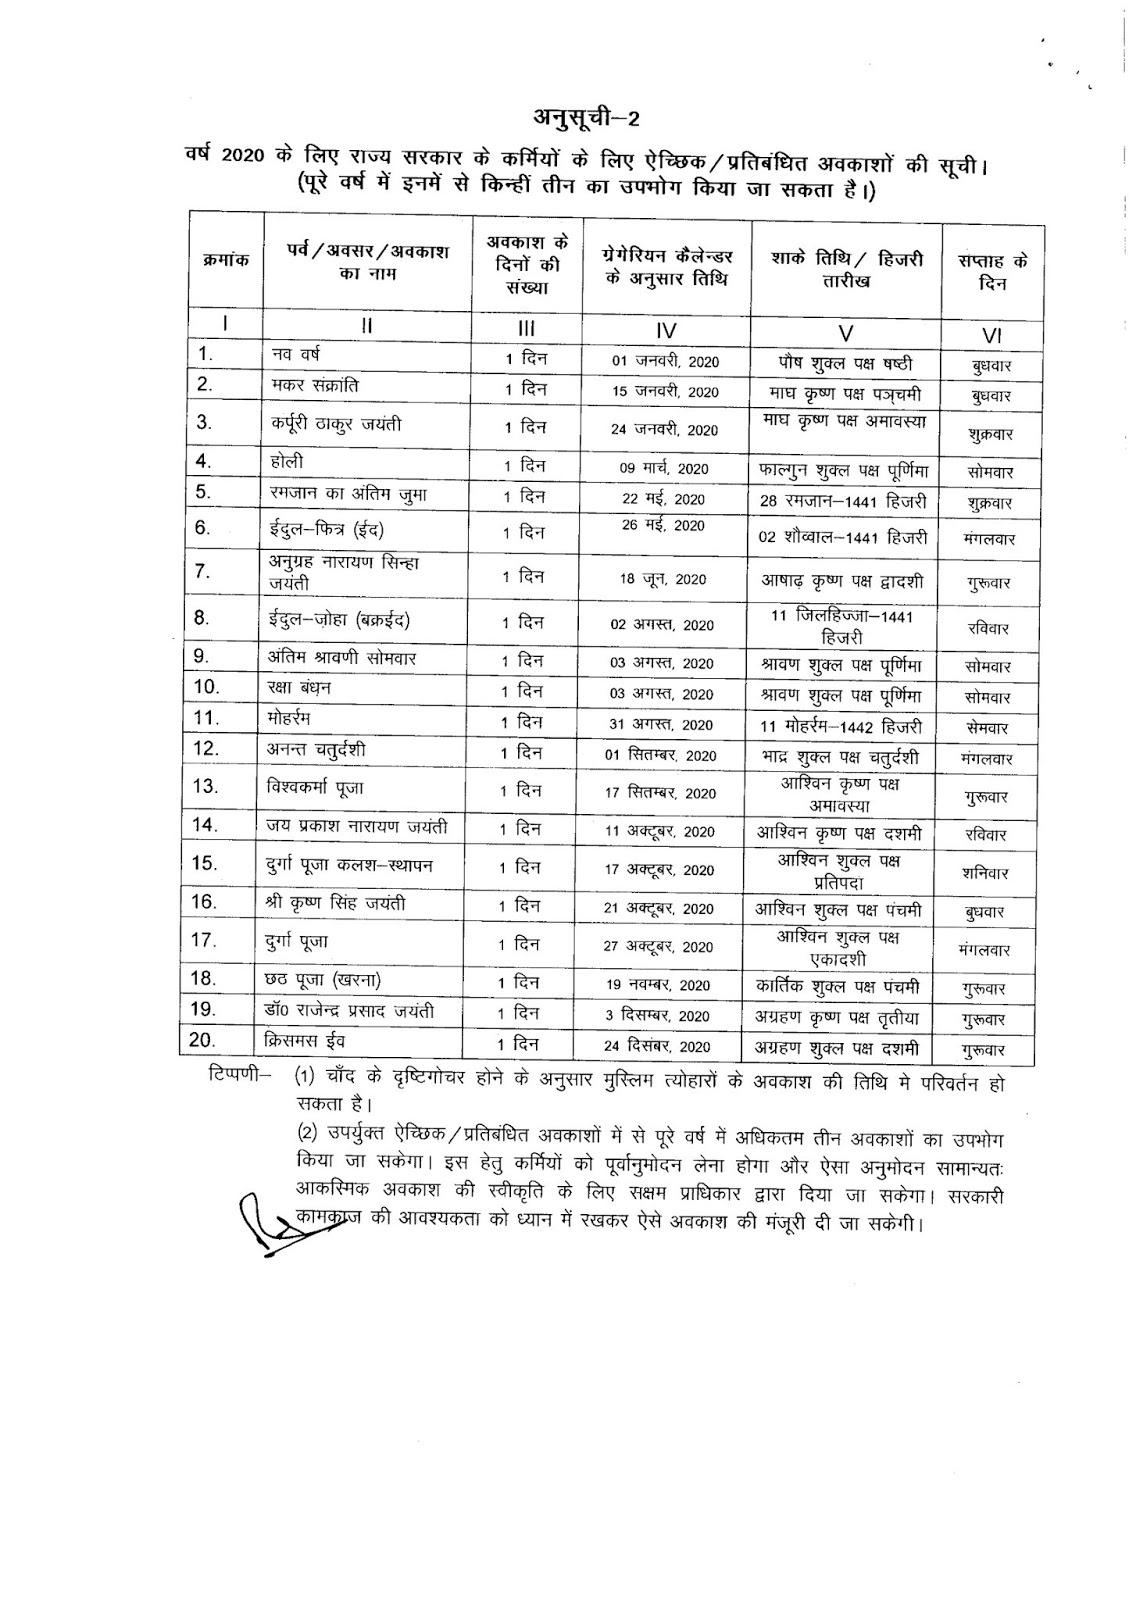 Bihar Government Calendar 2020 #educratsweb regarding Download Bihar Sarkar Calendar 2020